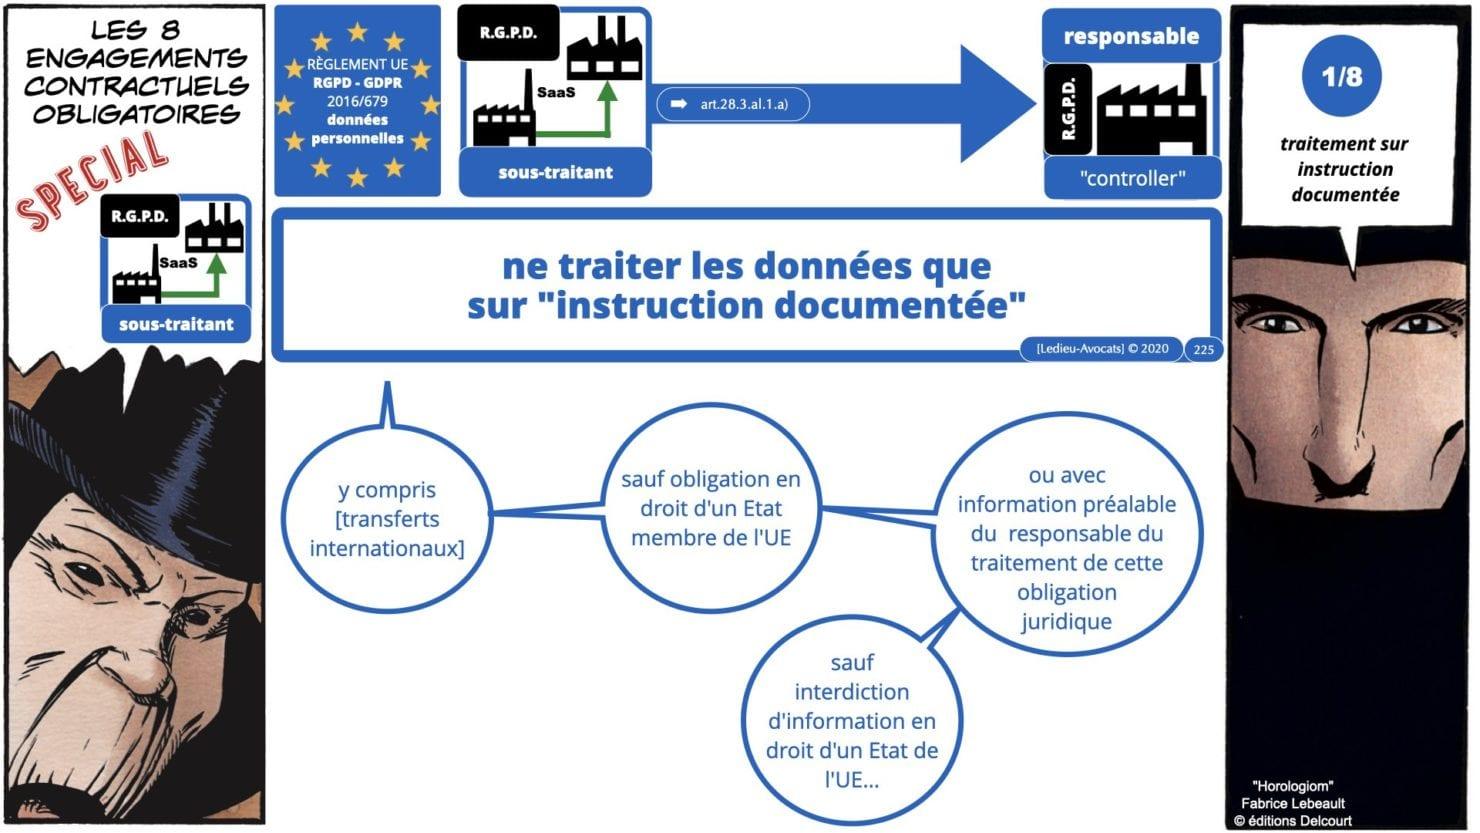 RGPD e-Privacy principes actualité jurisprudence ©Ledieu-Avocats 25-06-2021.225